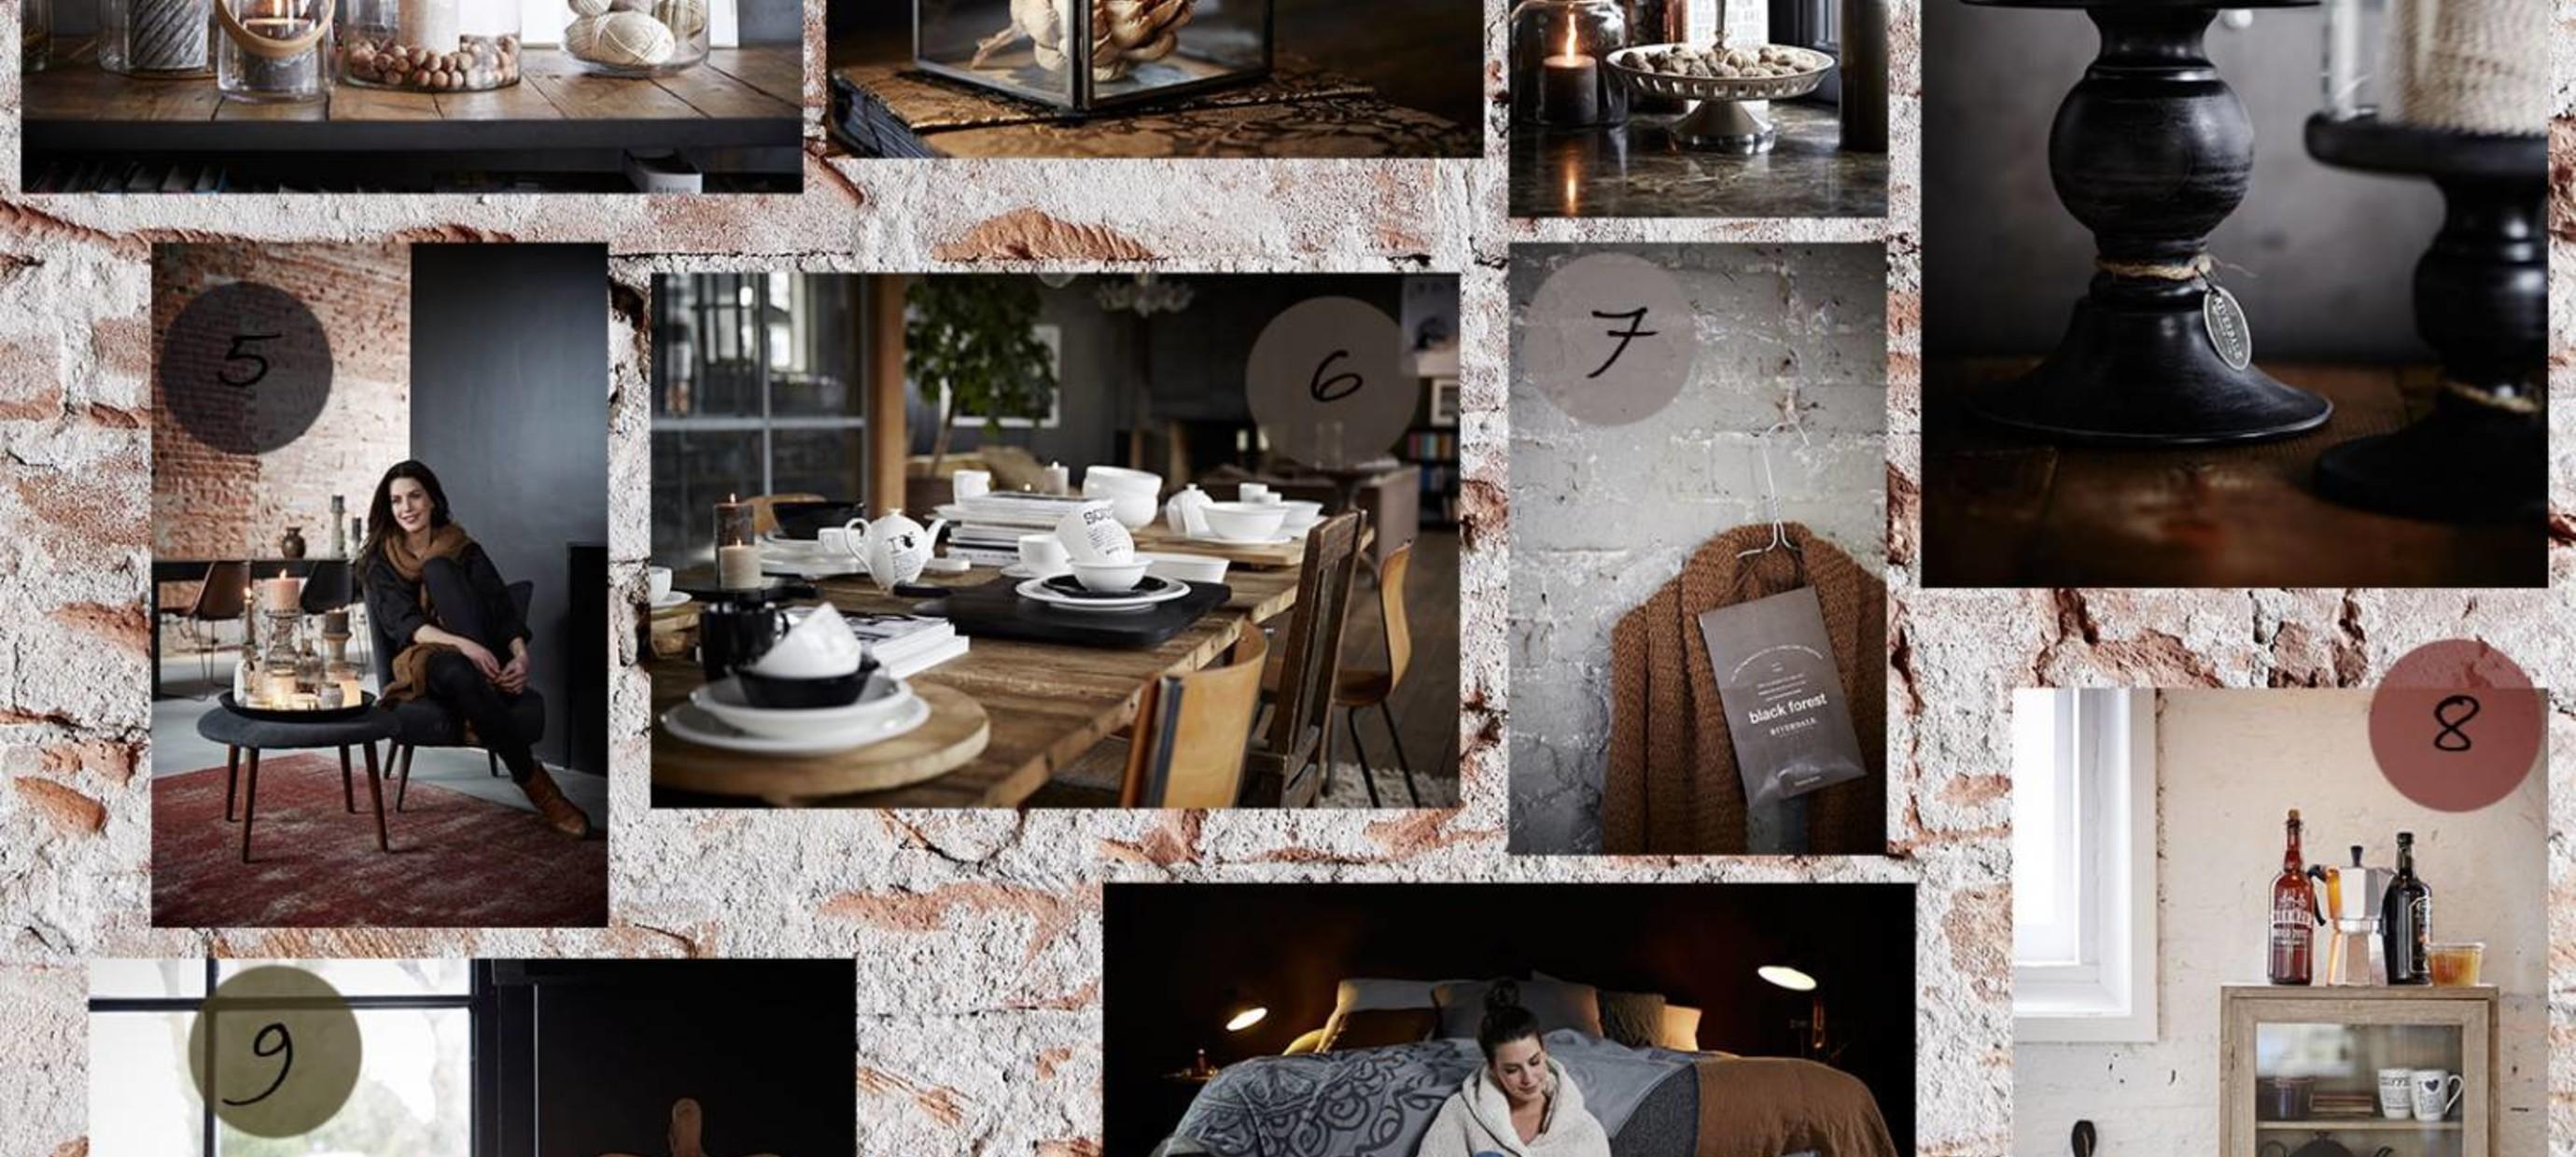 10 Styling Tips, Grand Café